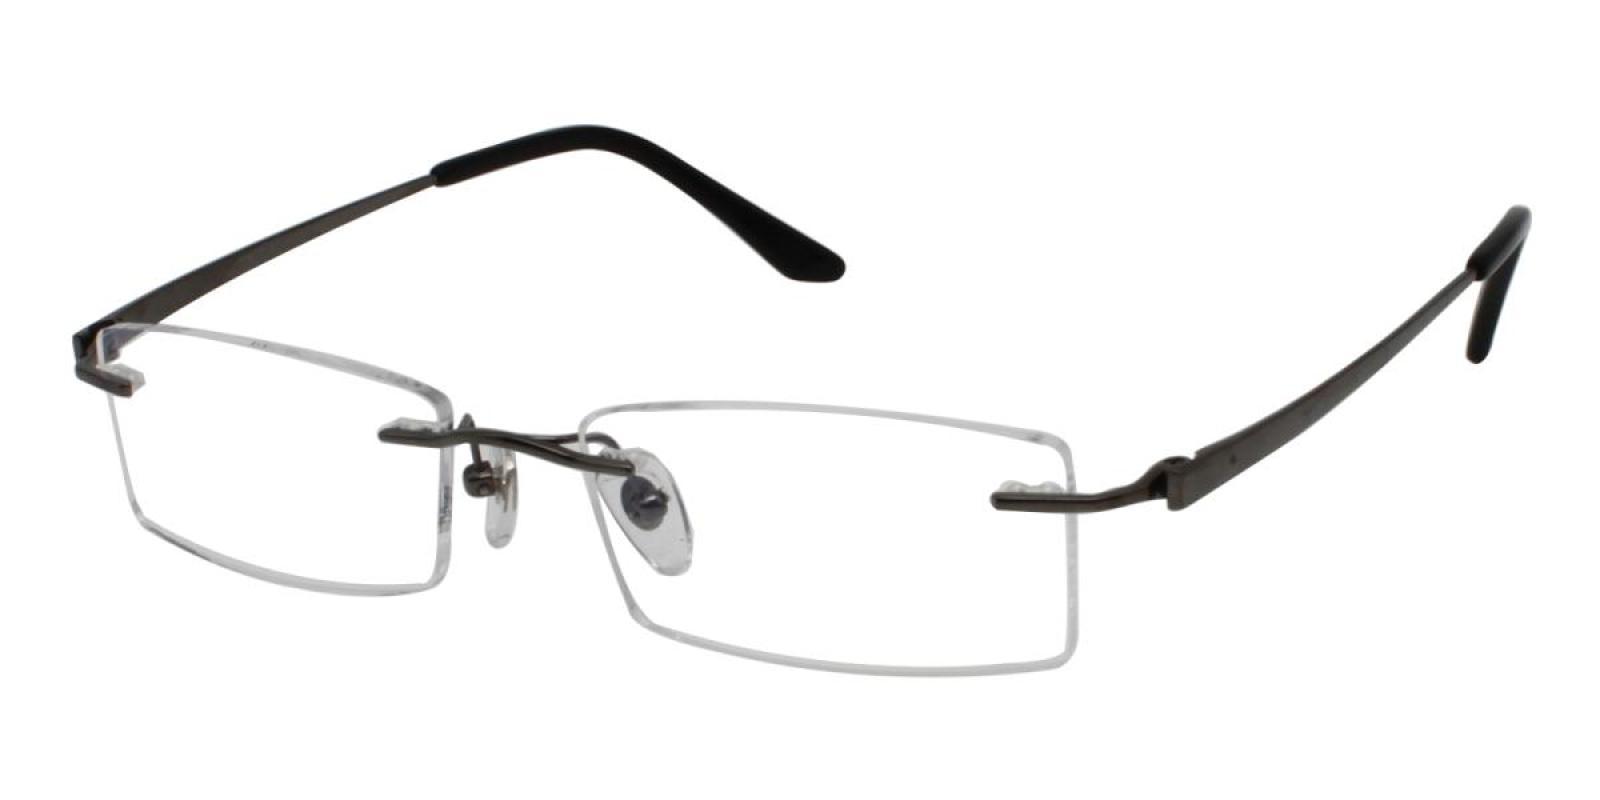 Benzalia-Gun-Varieties-Titanium-Eyeglasses-additional1